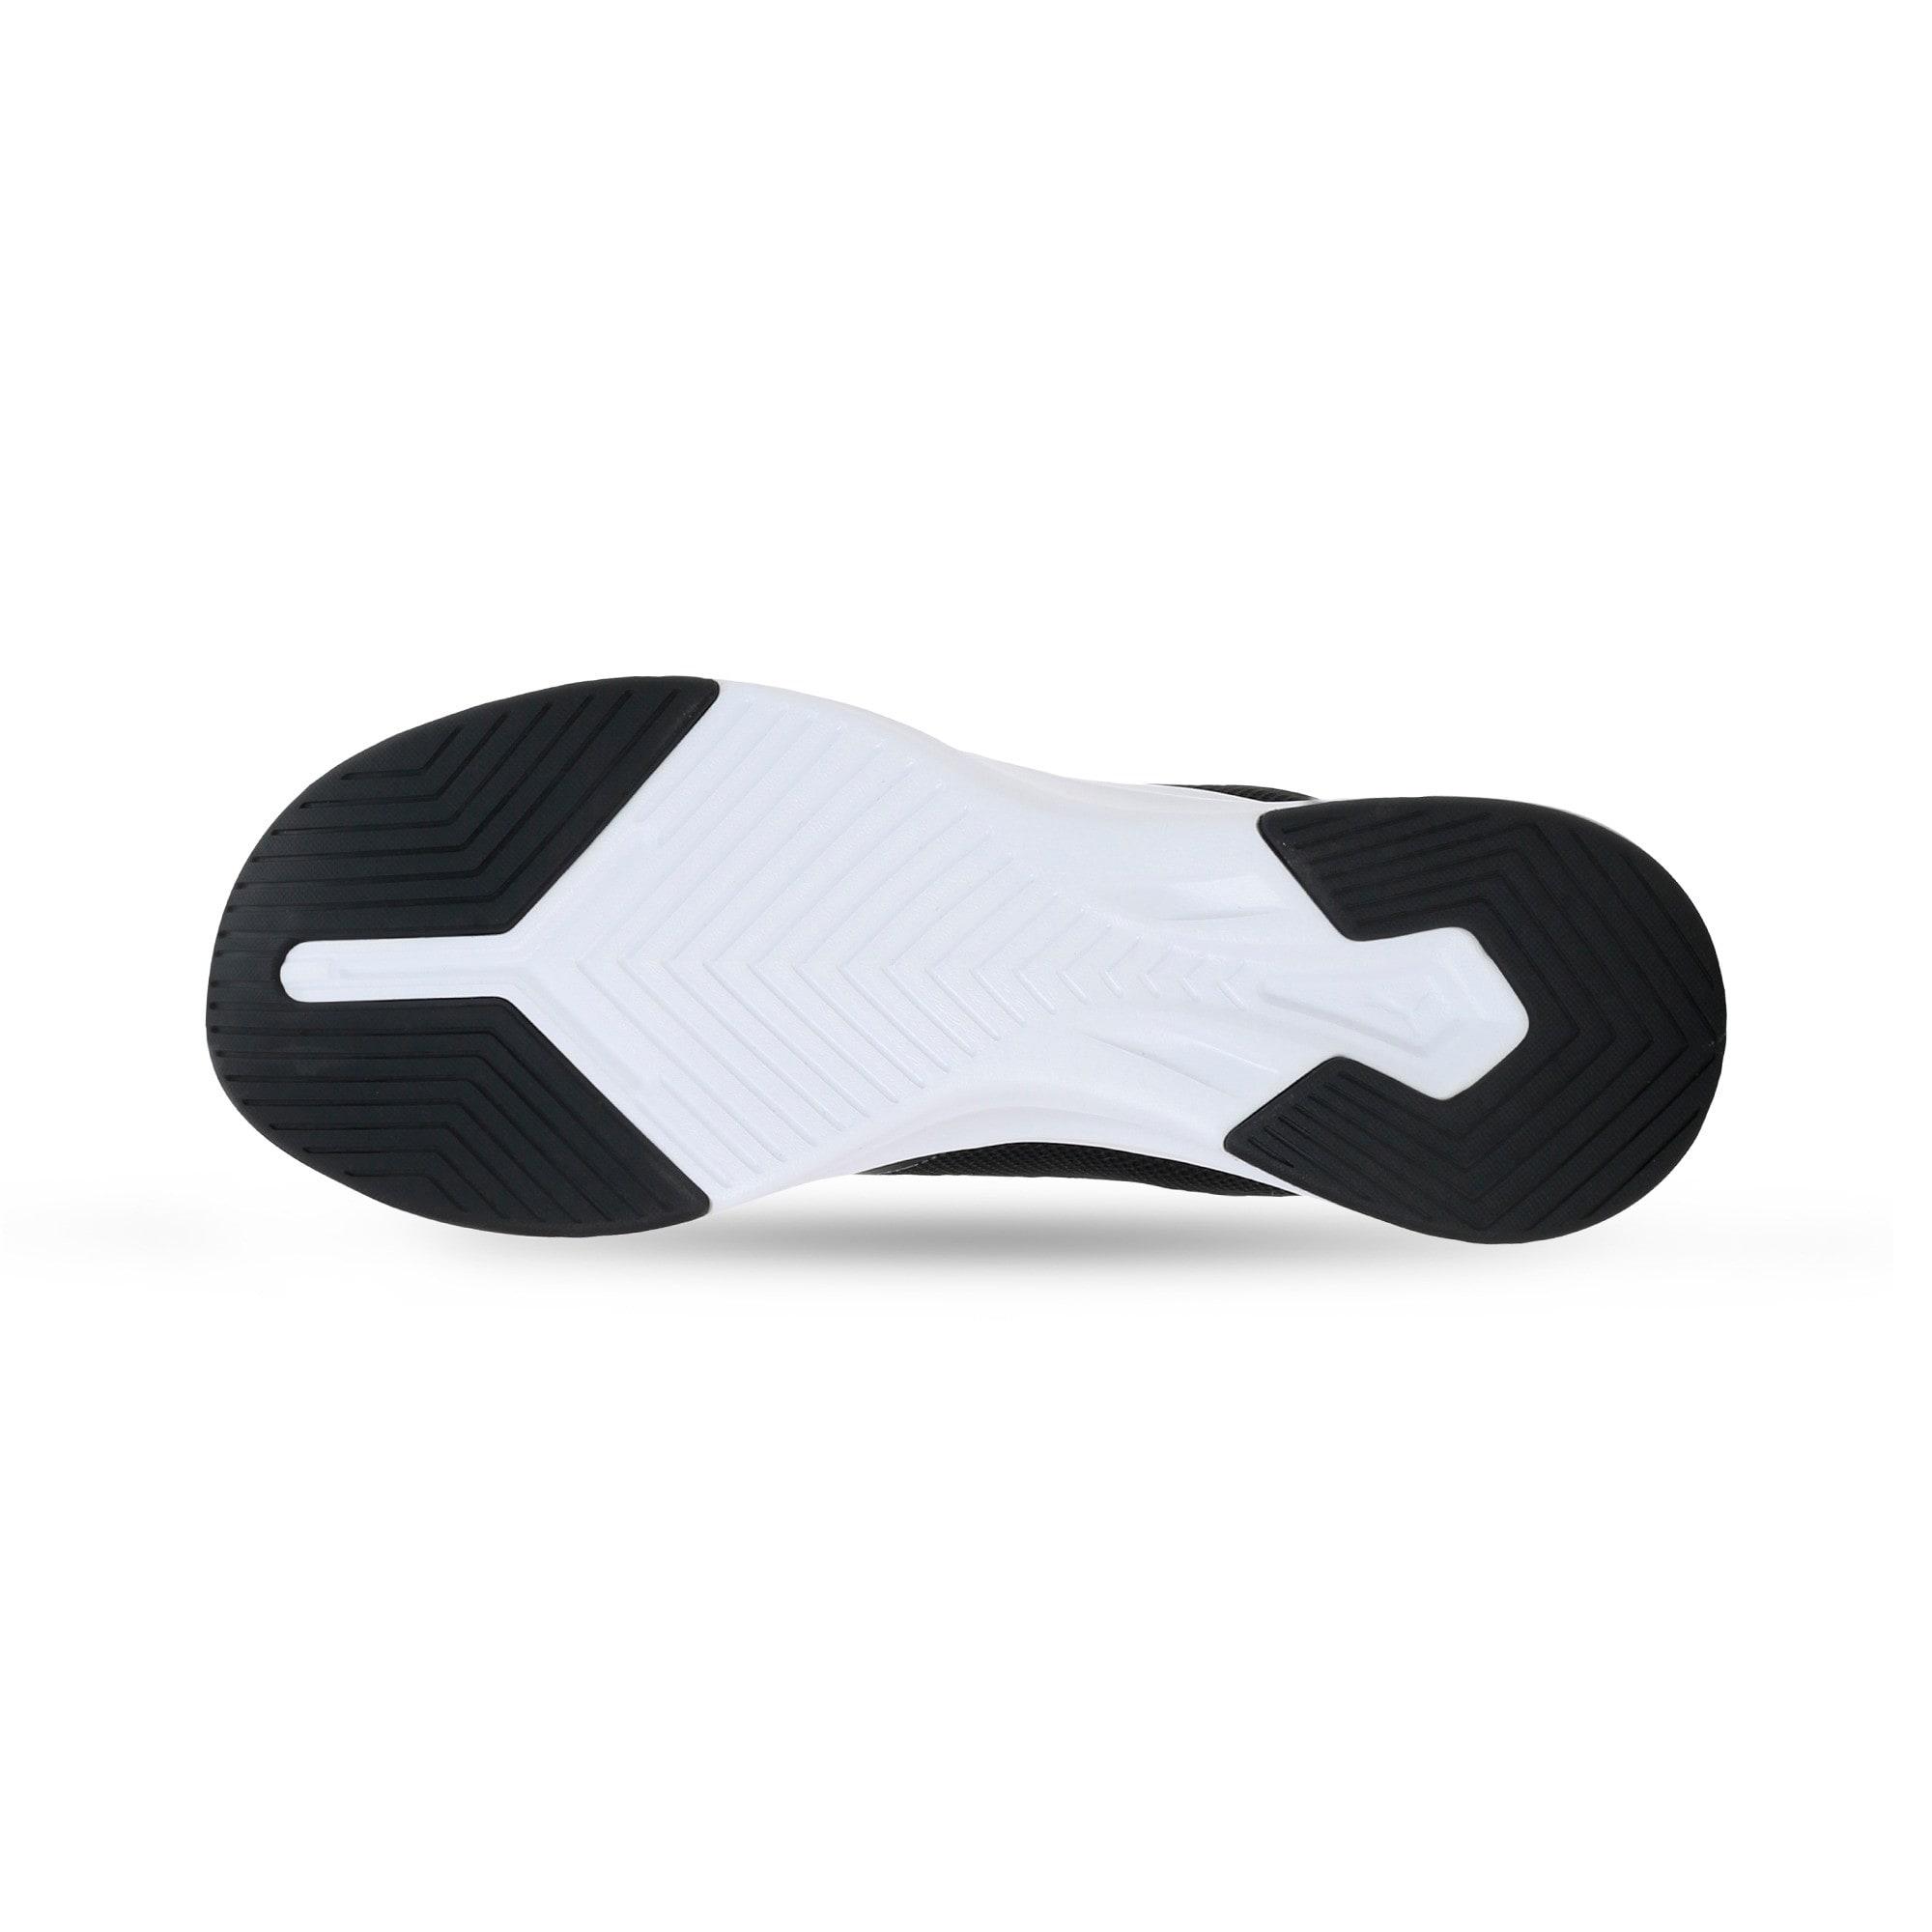 Thumbnail 3 of Extractor Running Shoes, Puma Black-Puma White, medium-IND